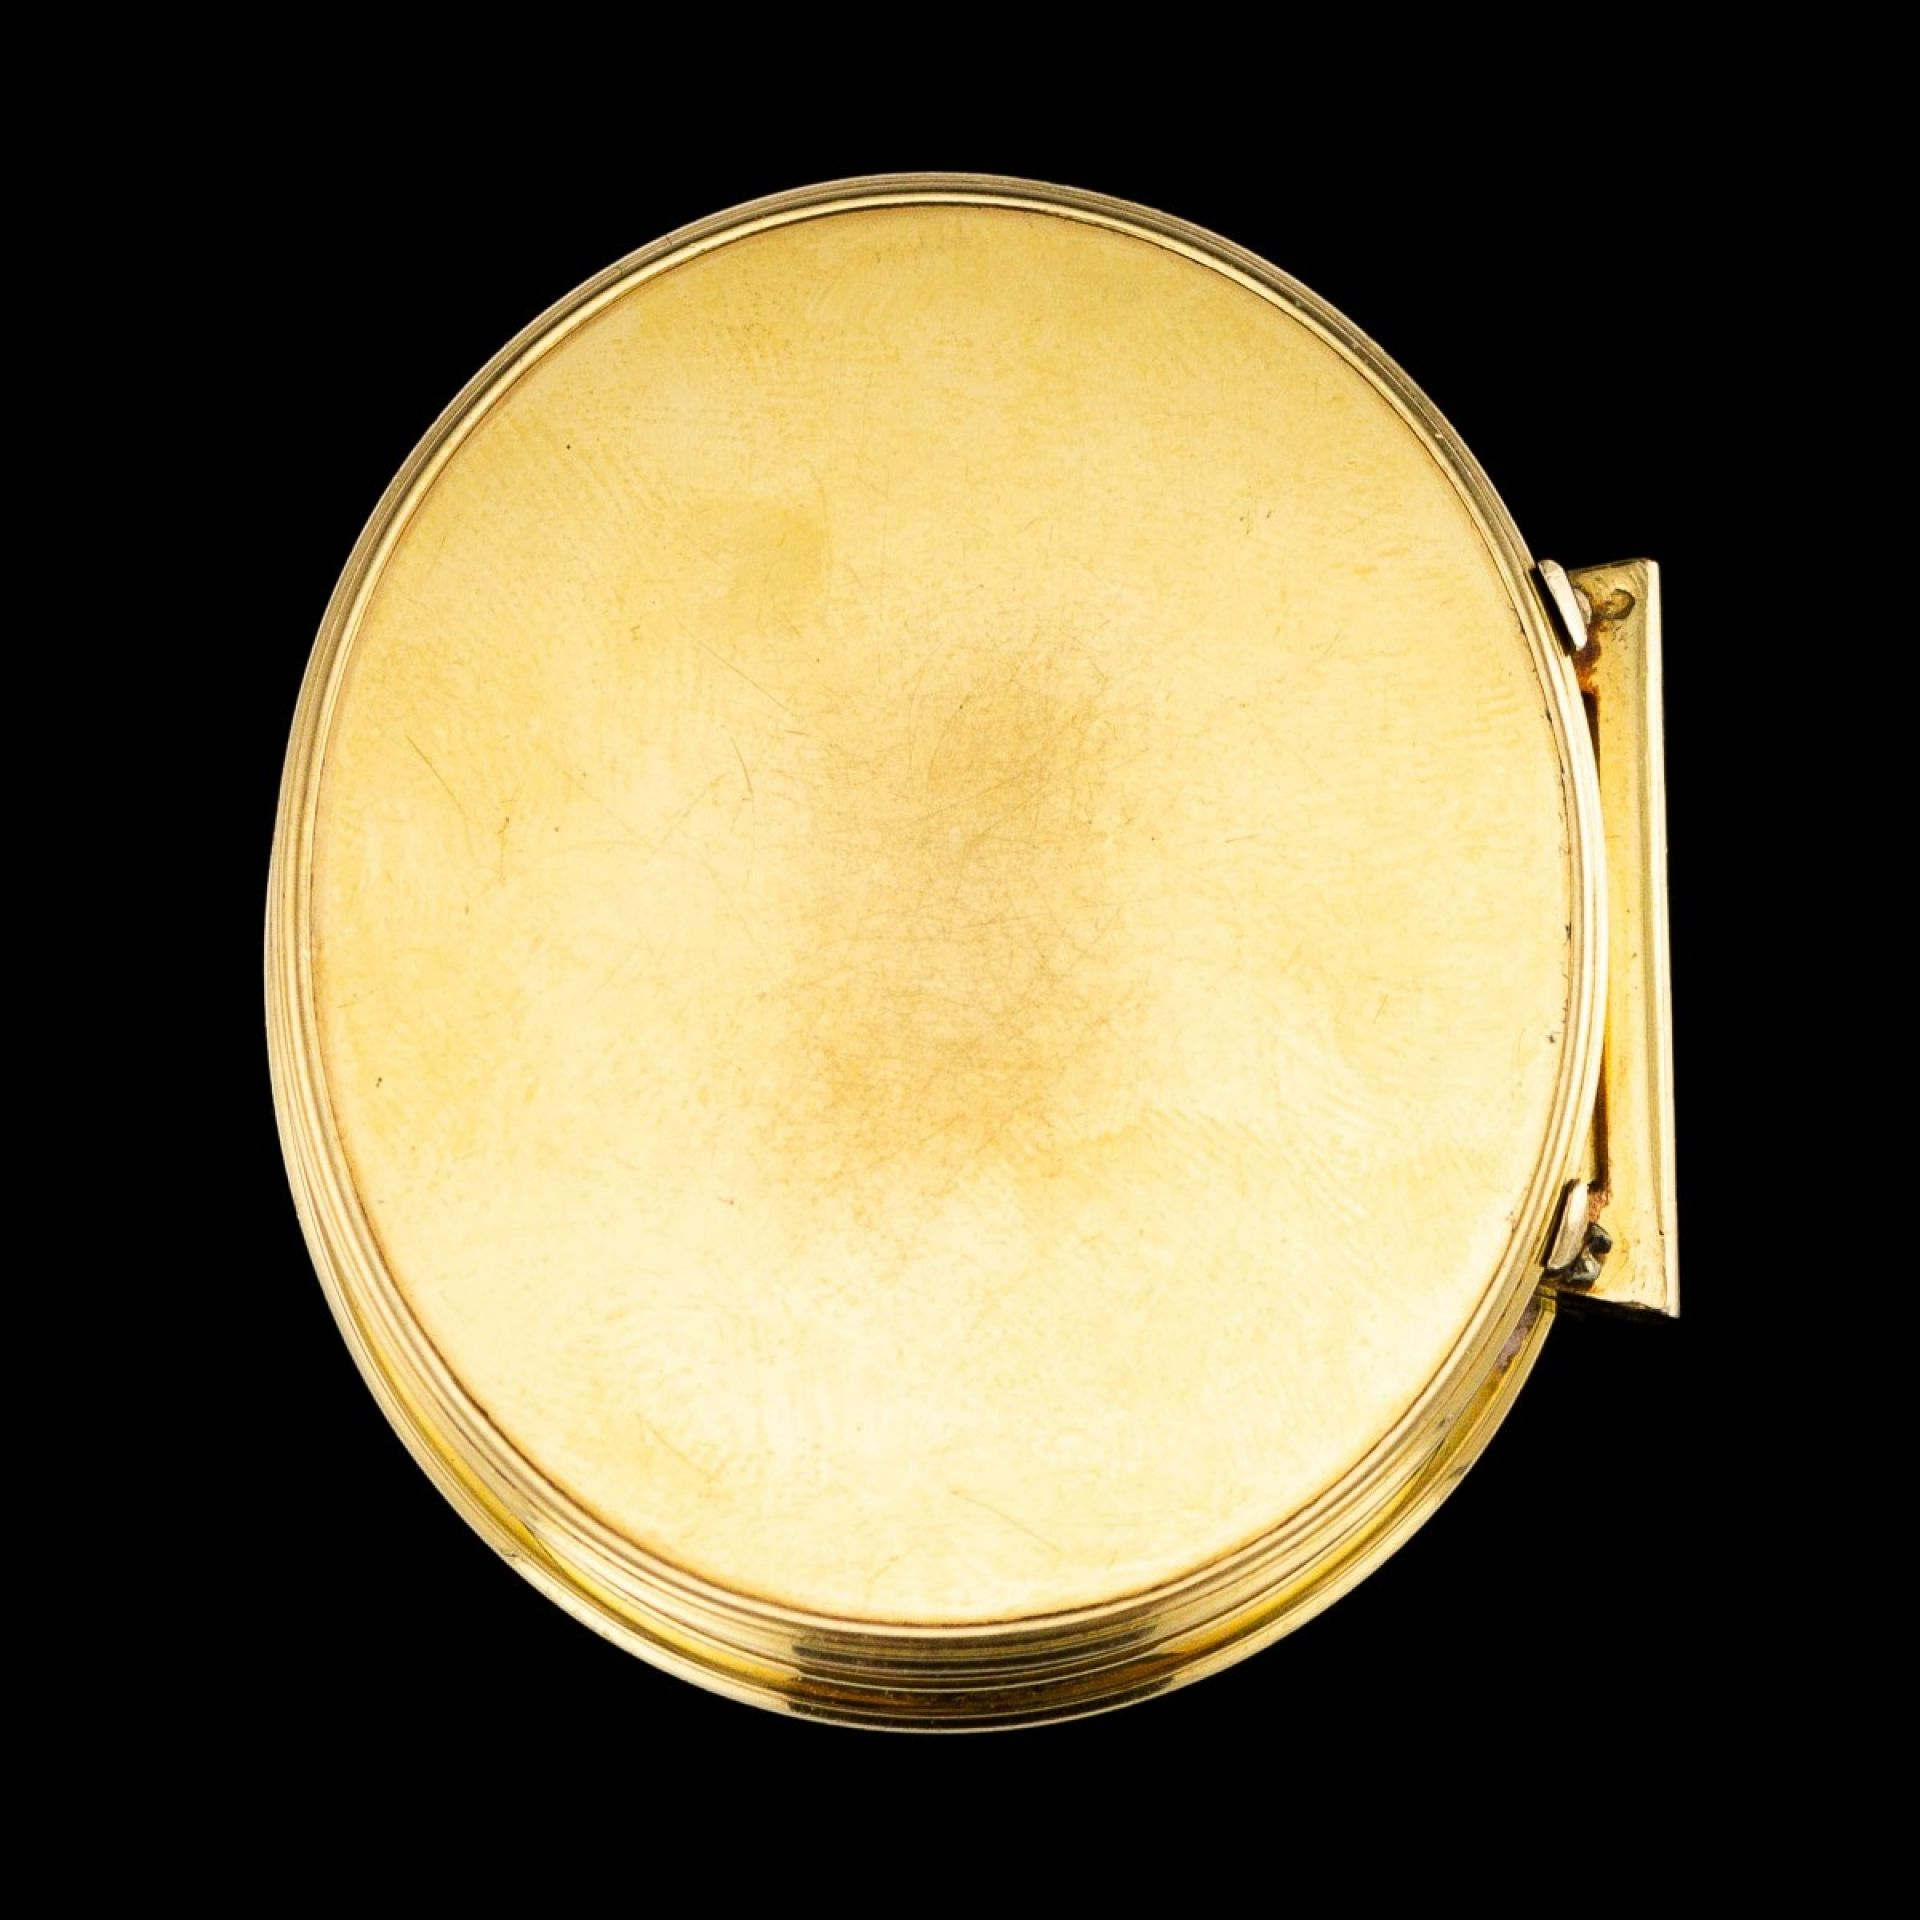 ANTIQUE 18thC RARE DUTCH 18k GOLD SNUFF BOX, AMSTERDAM c.1739